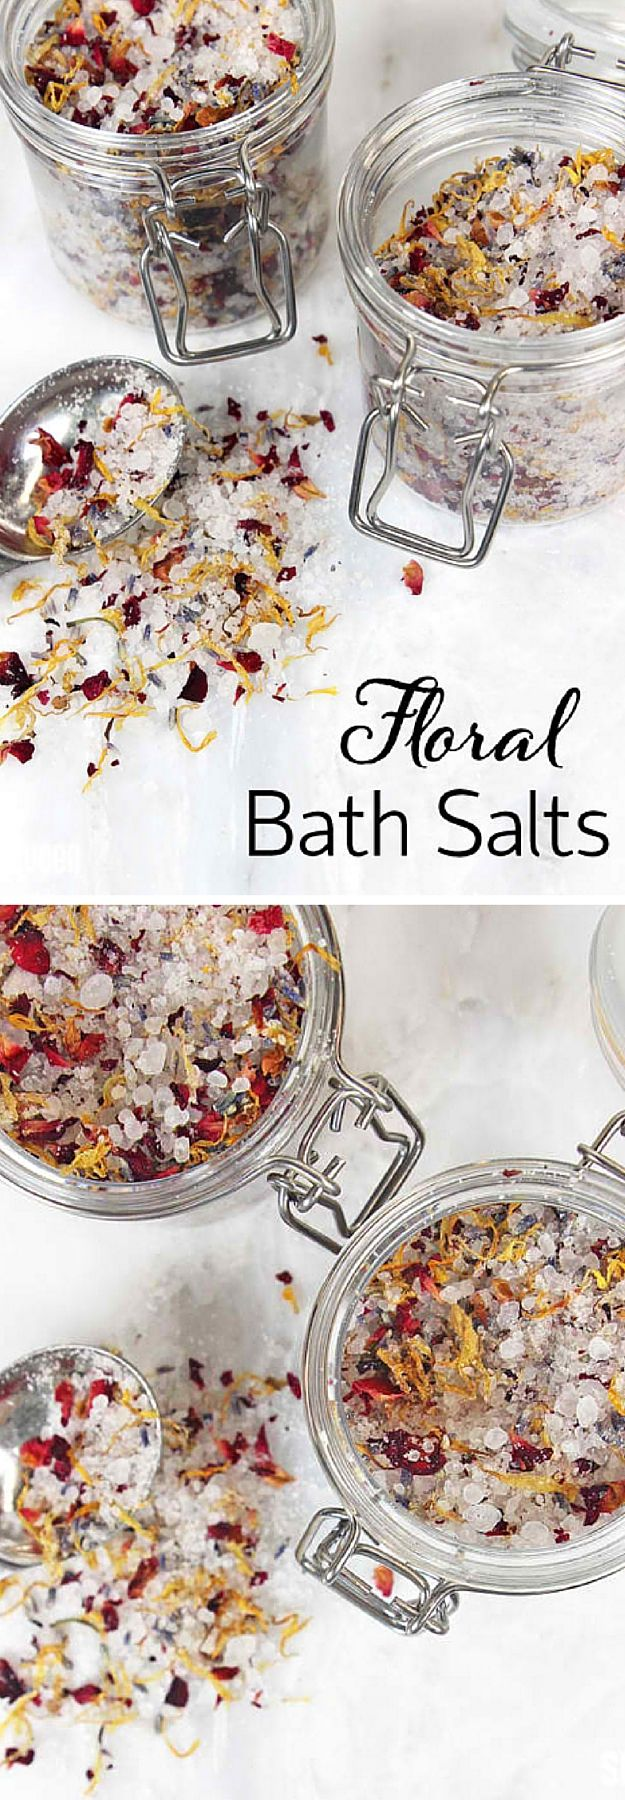 Floral Bath Salts DIY Bath Salts